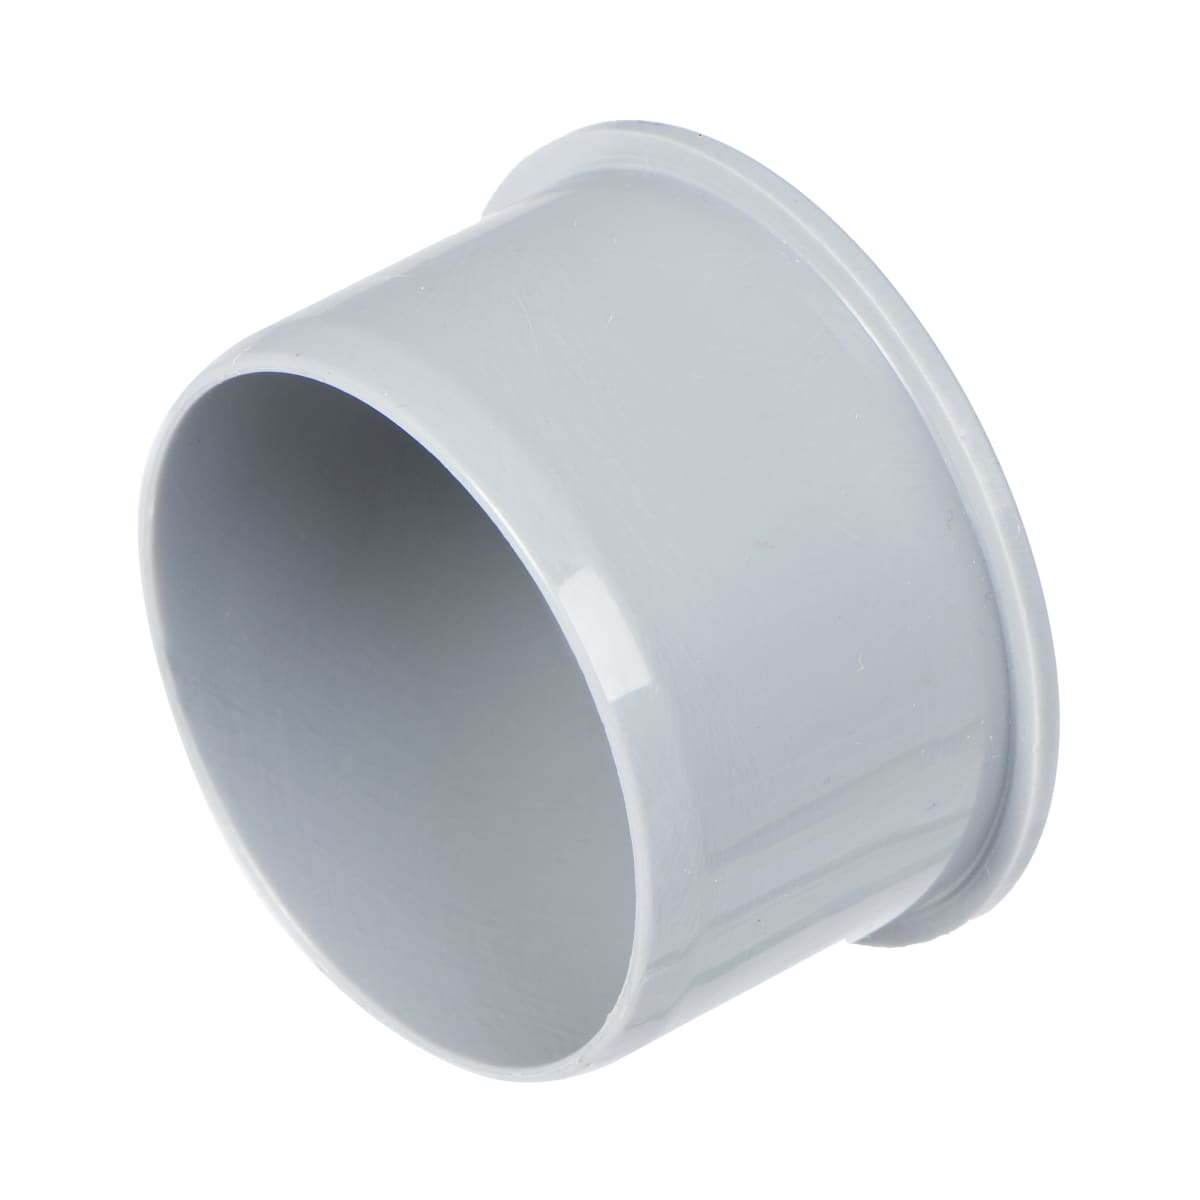 Заглушка Ø 50 мм полипропилен